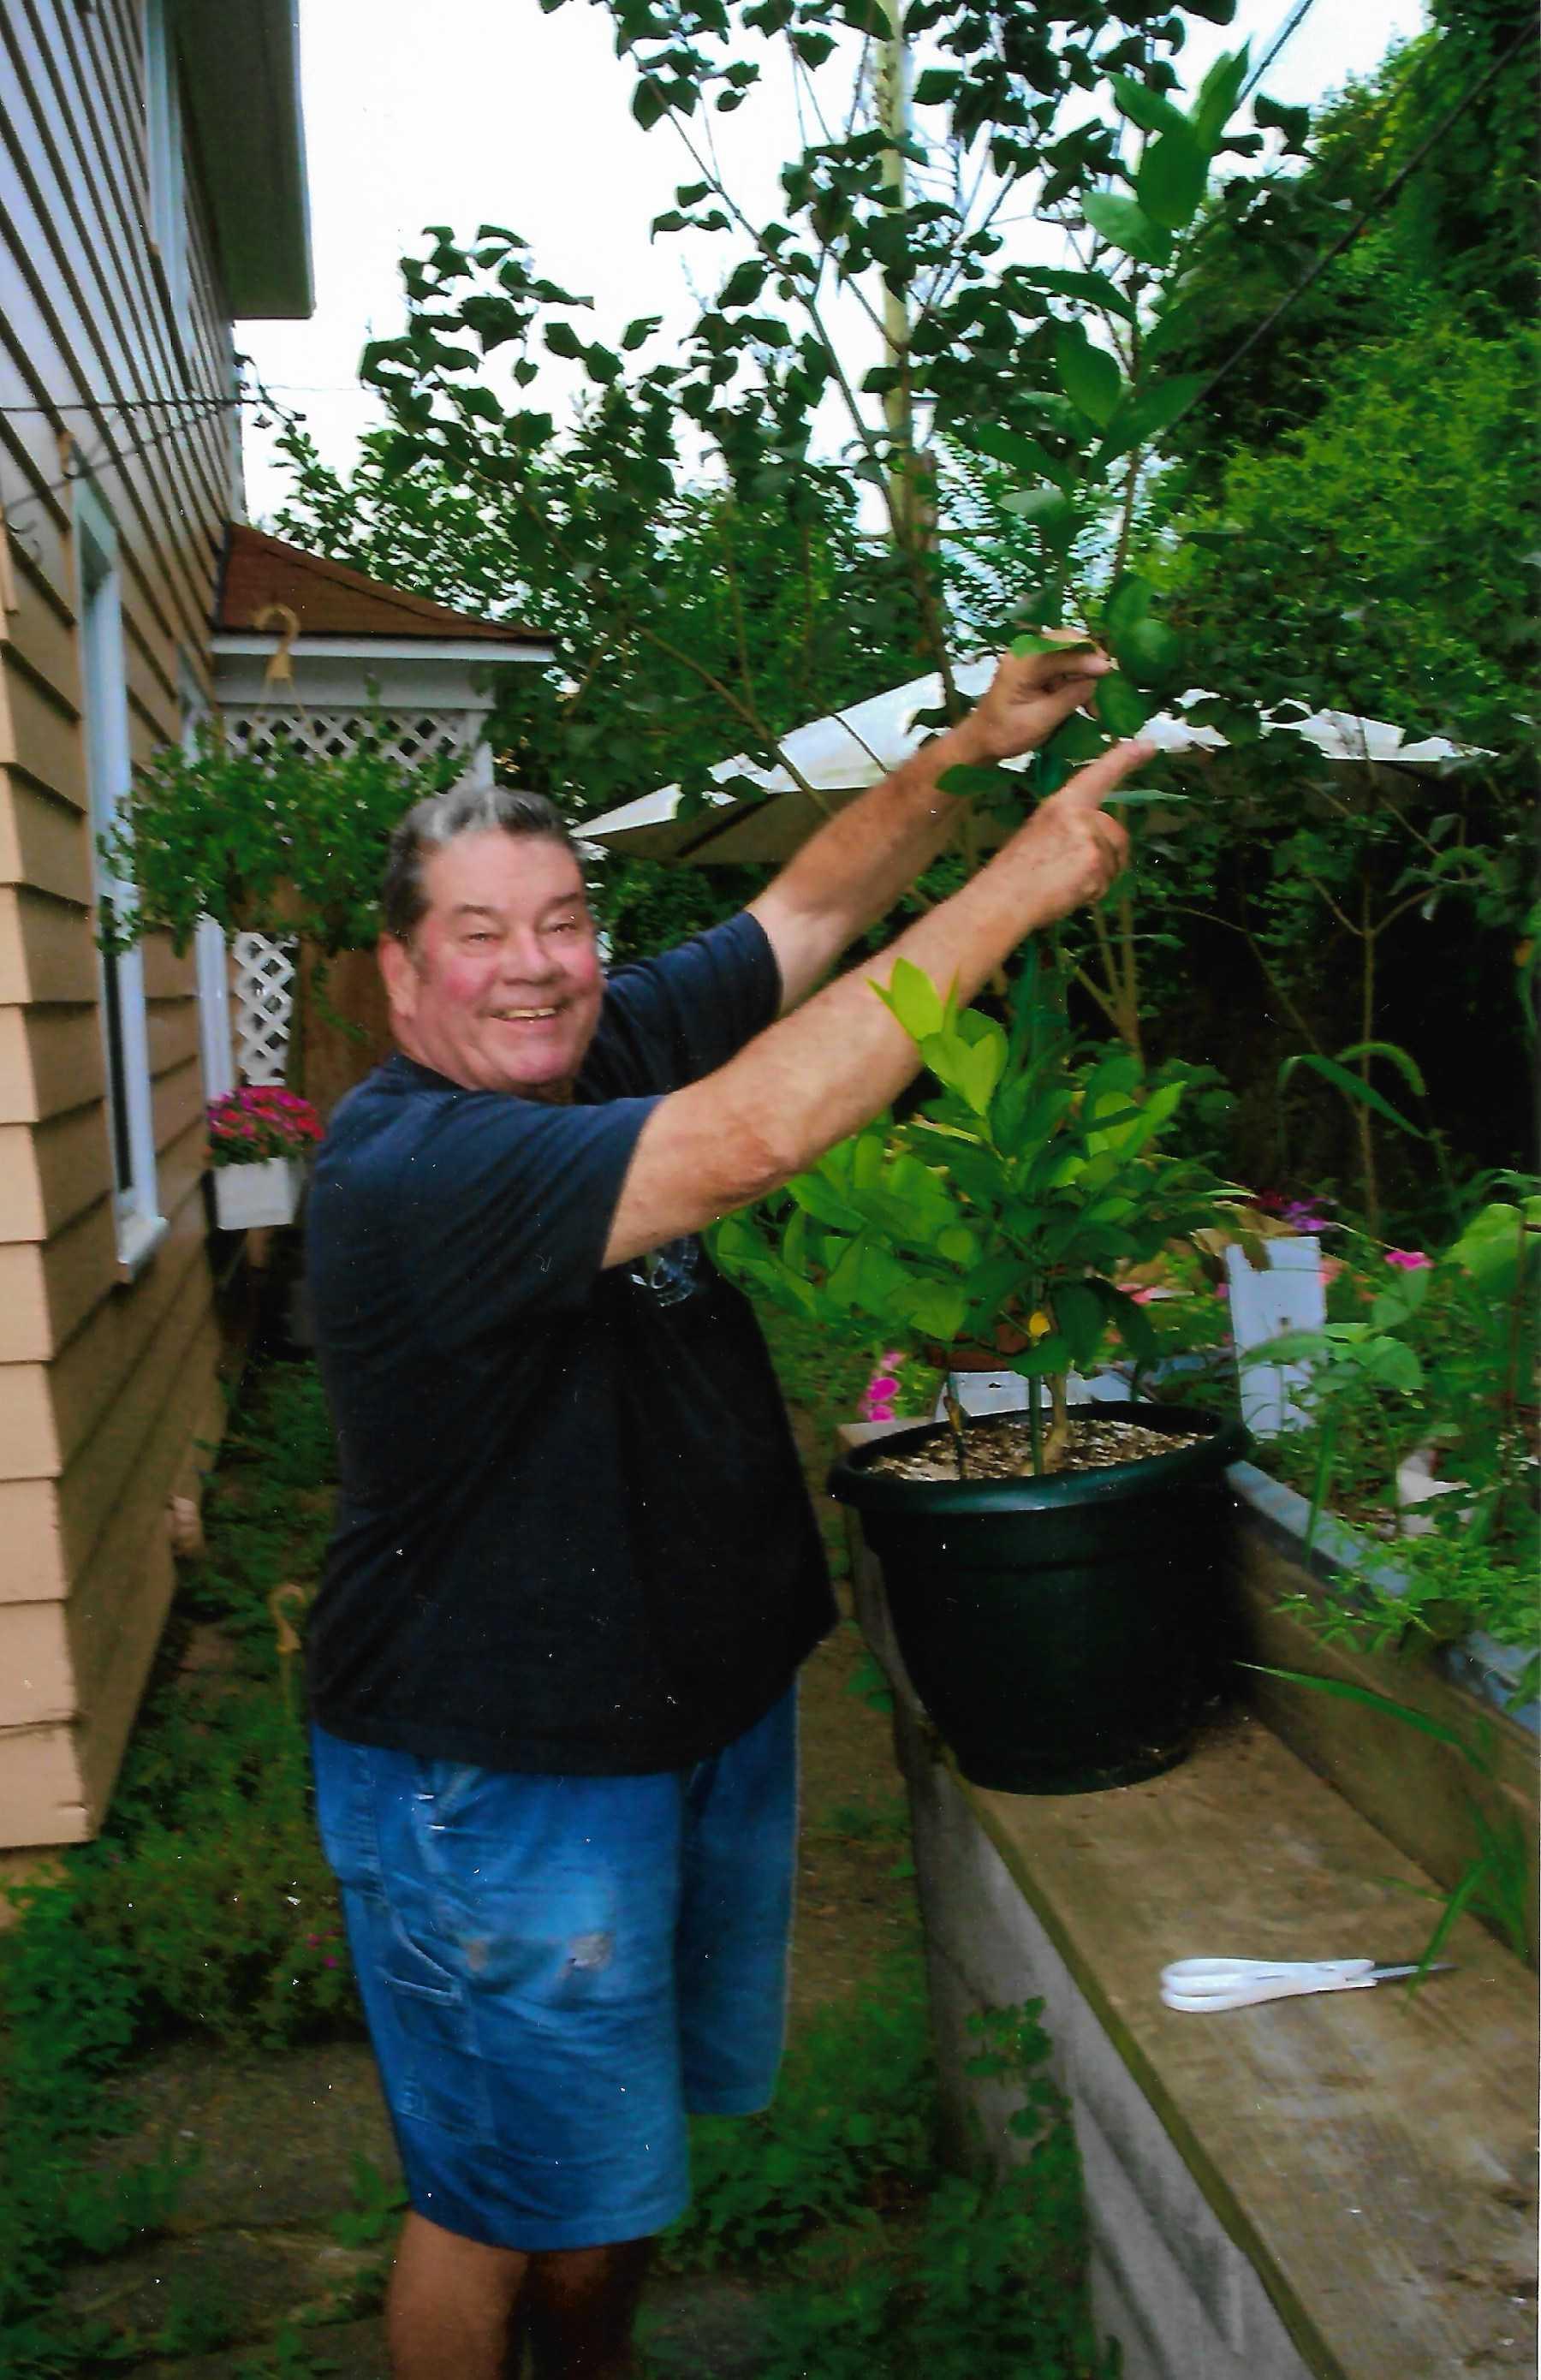 Vinny with plants